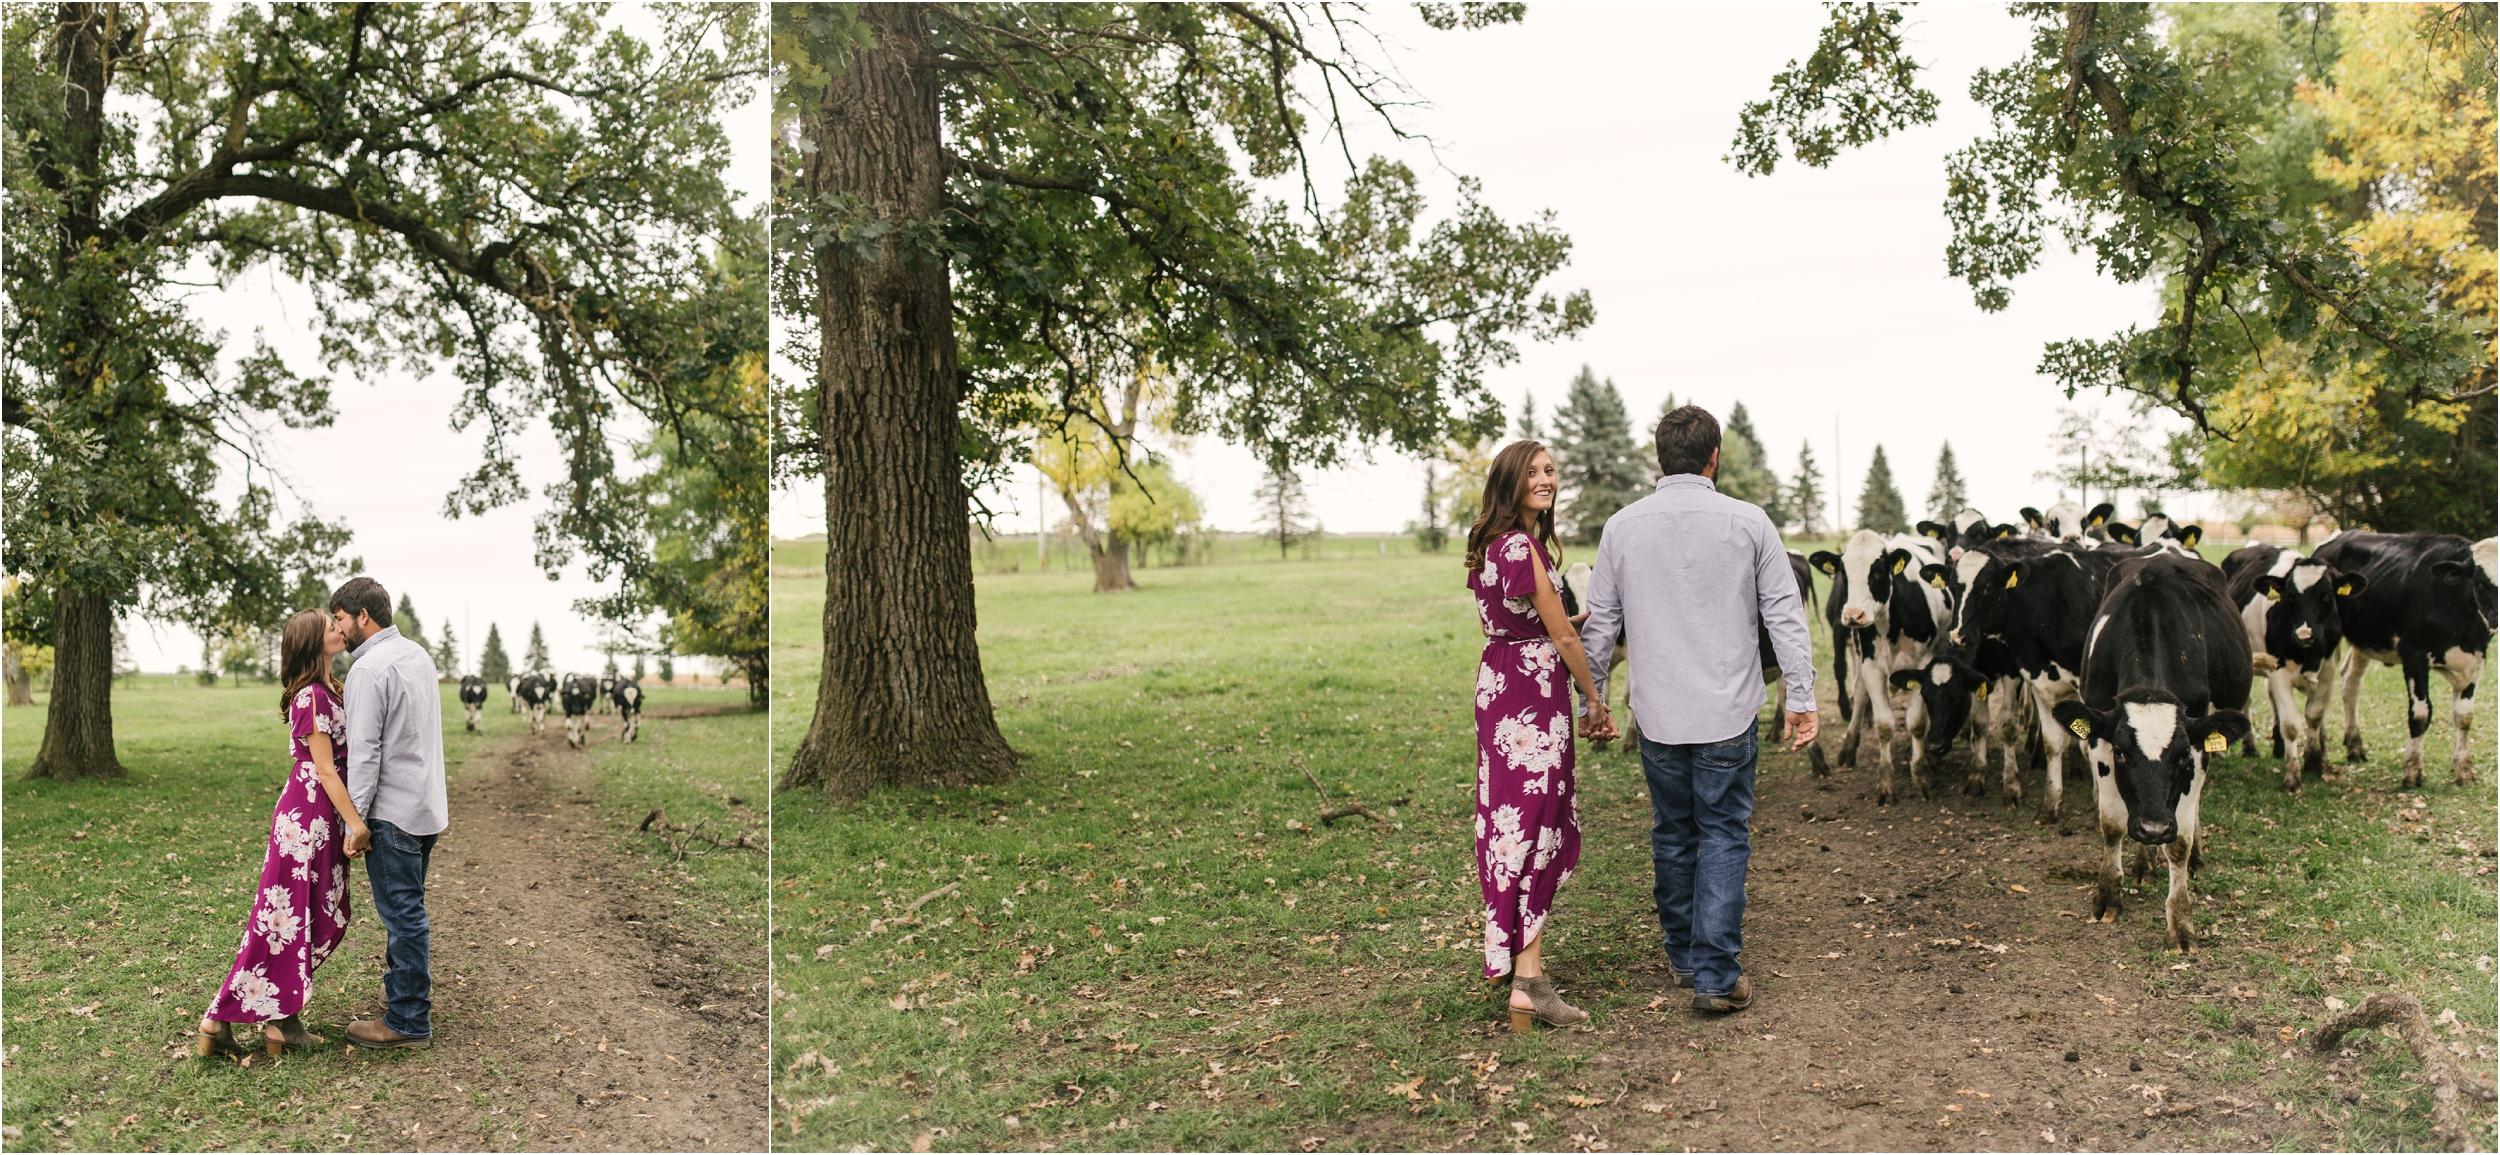 Countryside Engagement Photos_ Minnesota Wedding Photographer_Stephanie Lynn Photography_0058.jpg